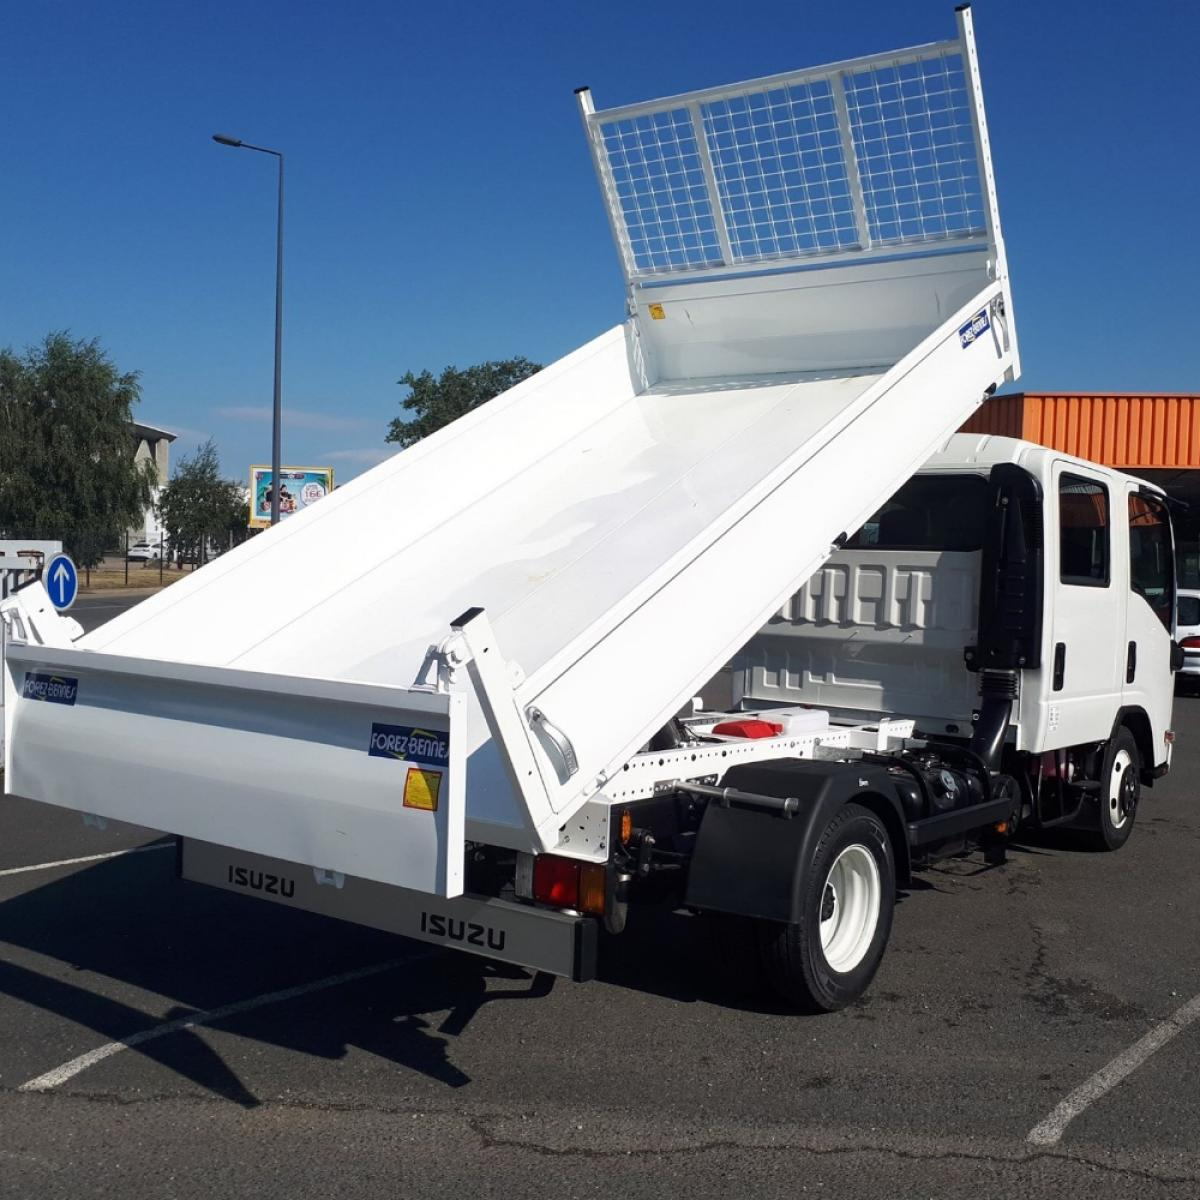 Isuzu M21 Large Double Cab Usabilita